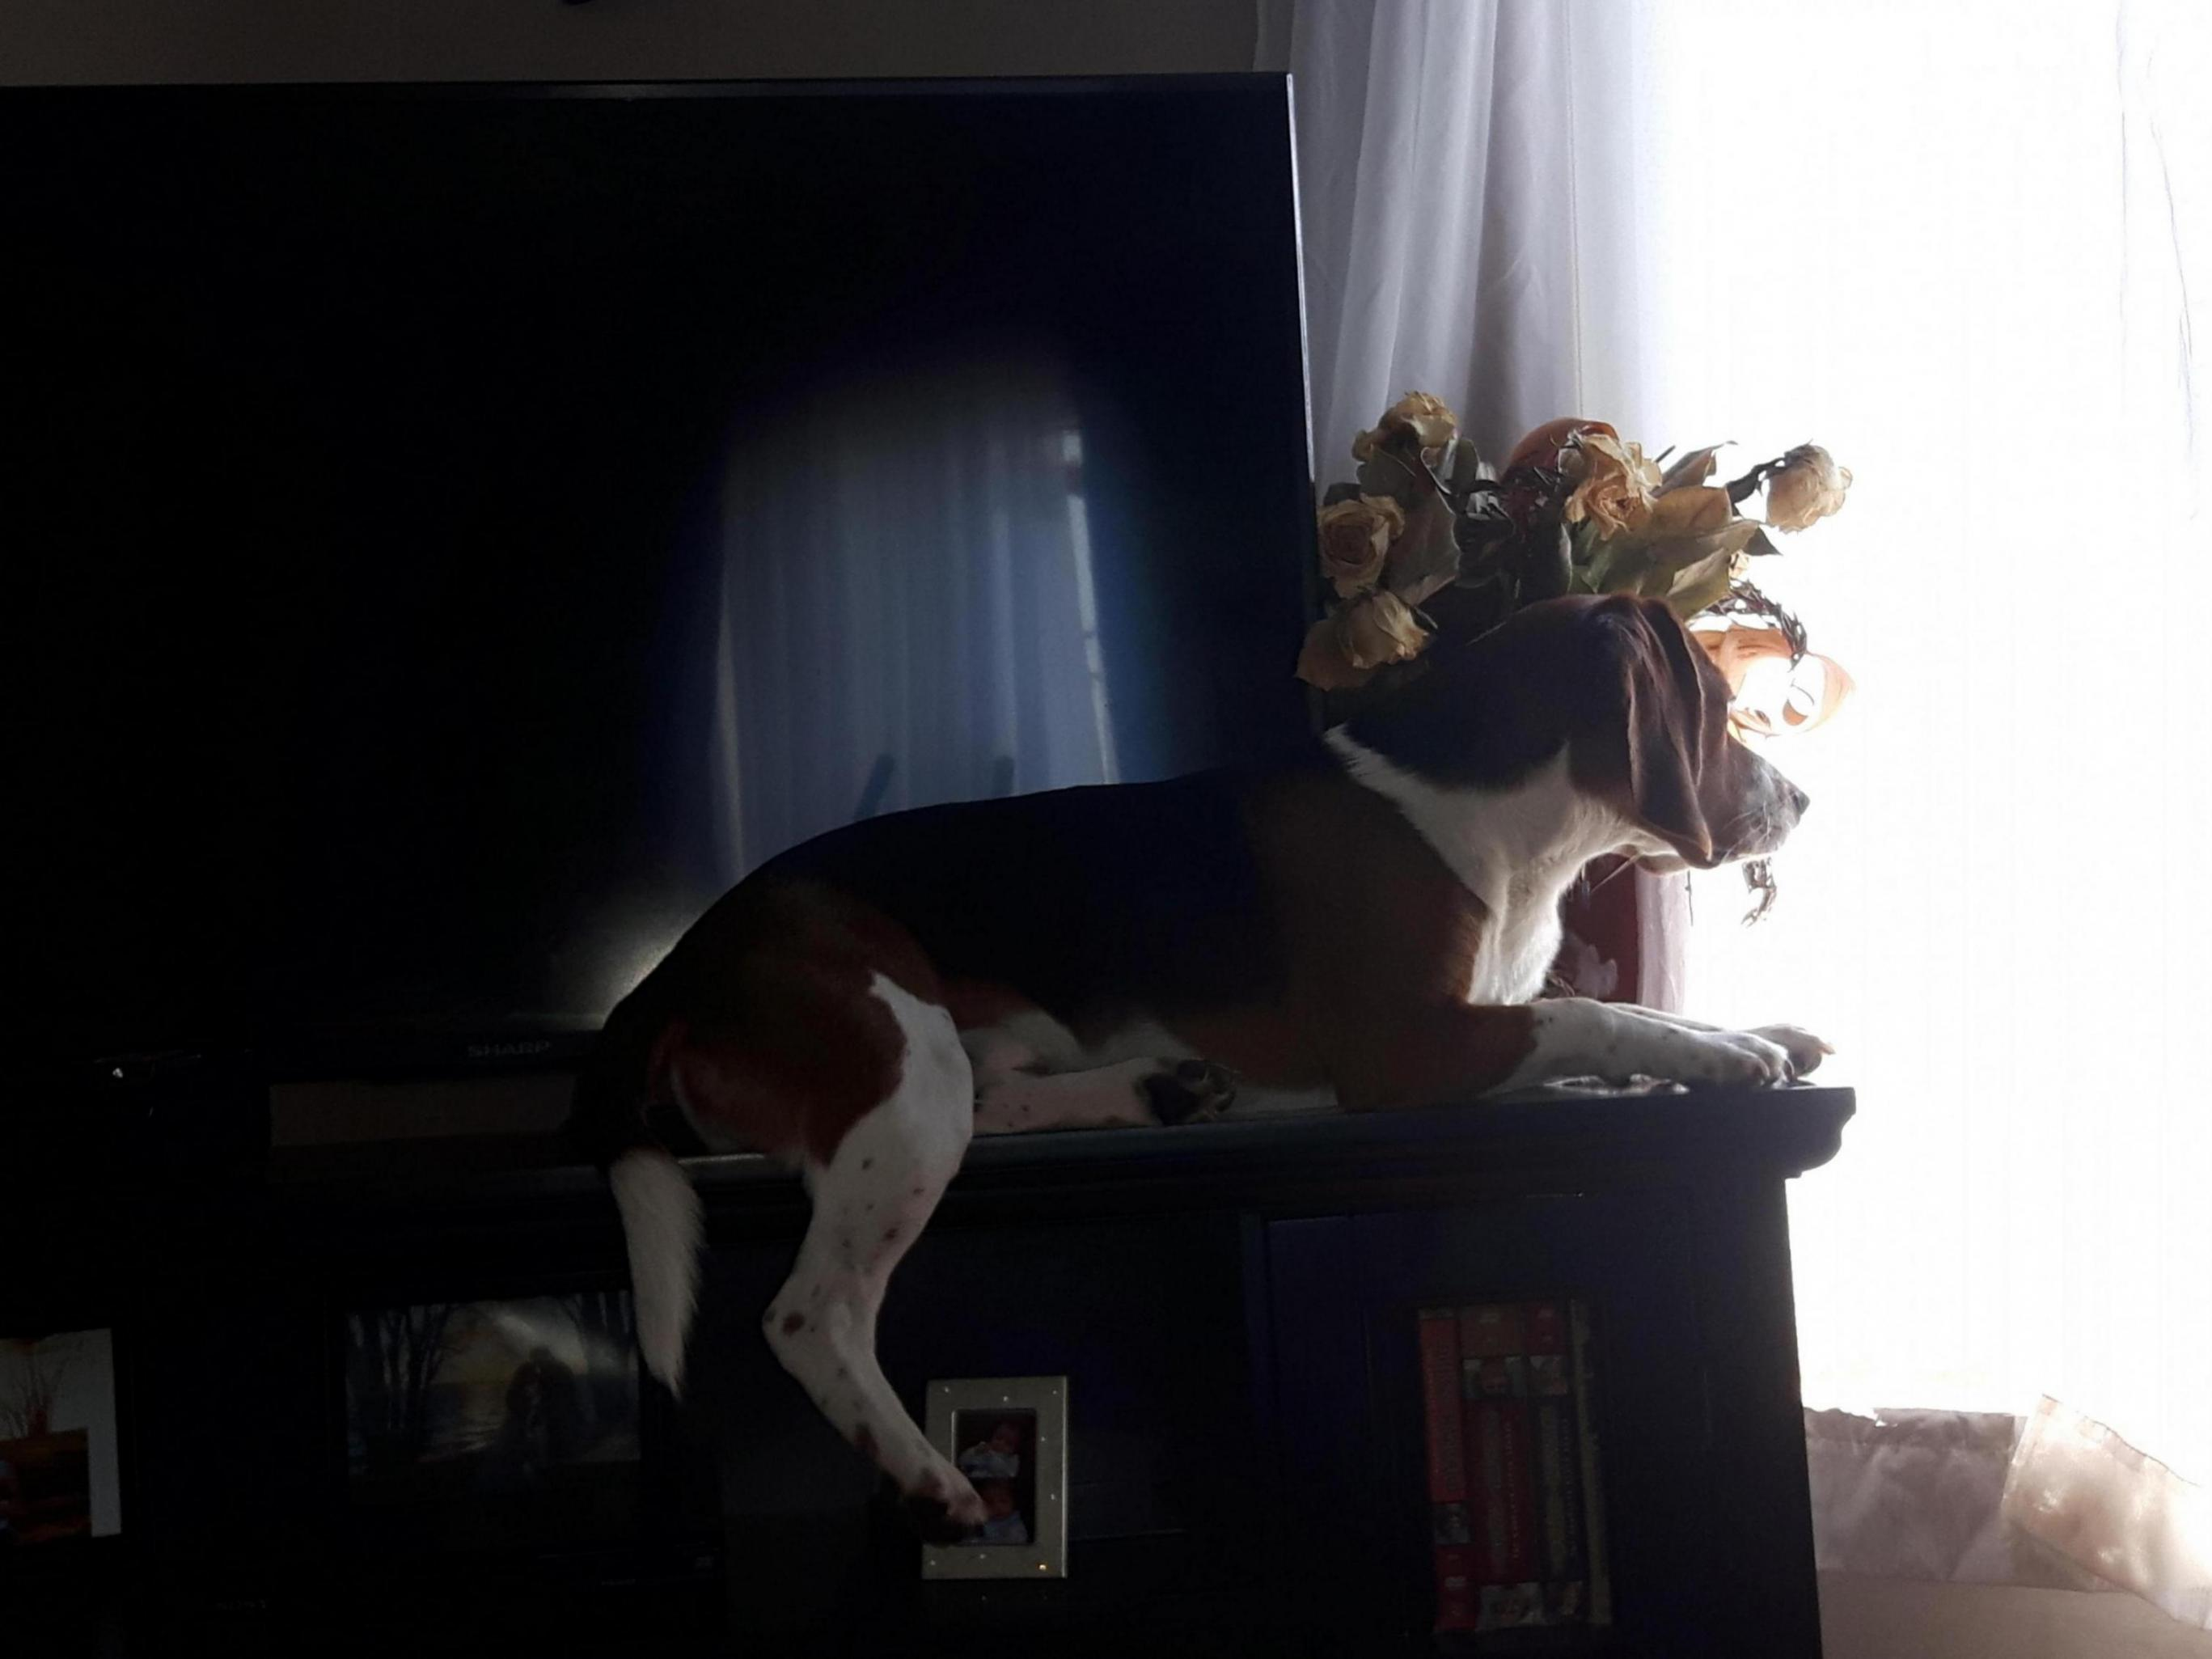 Boast about your Beagle-20190725_112651_1565132284362.jpg